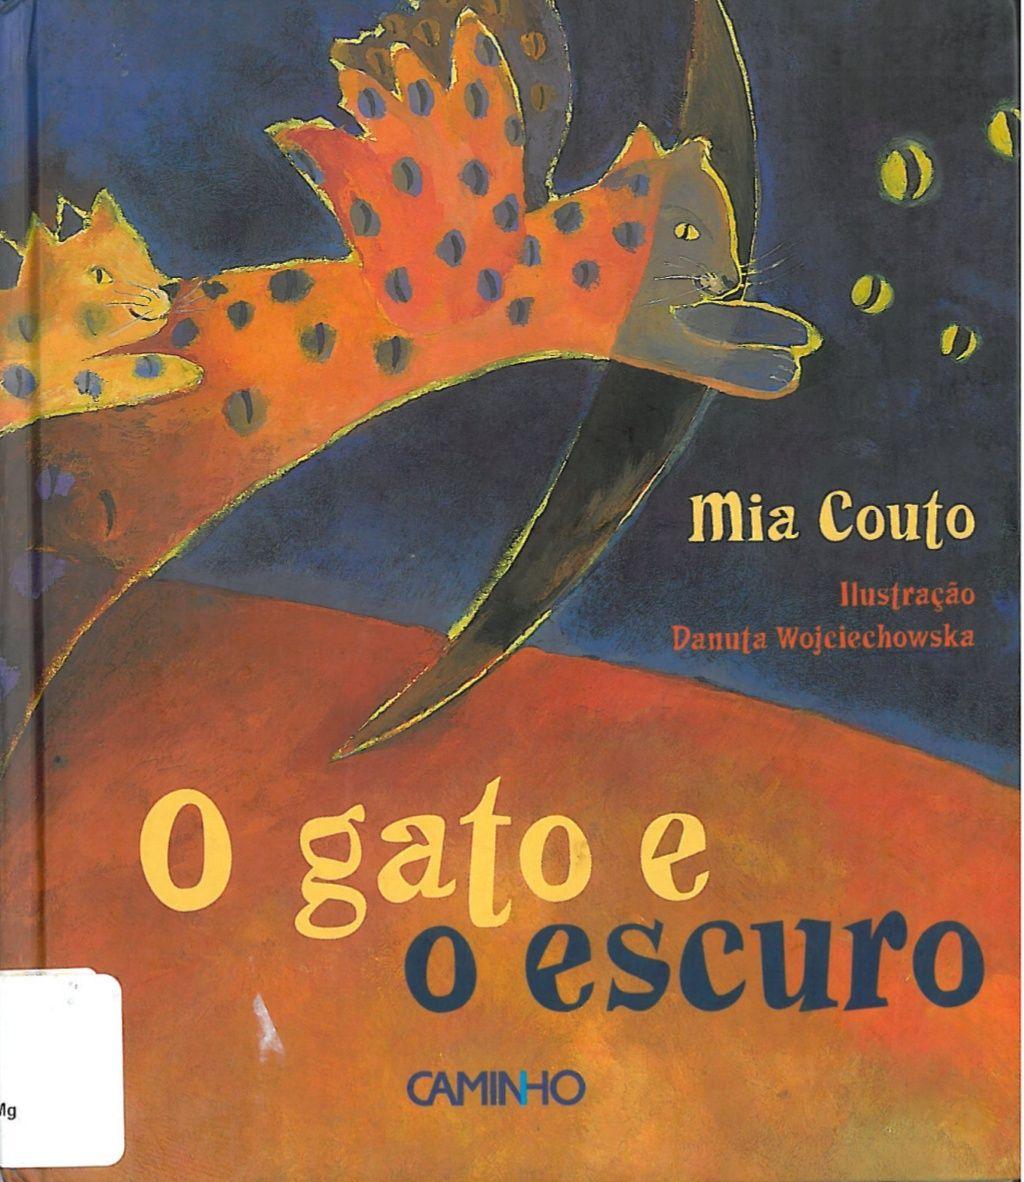 O Gato e o Escuro (Mia Couto) by Jf Lm via slideshare